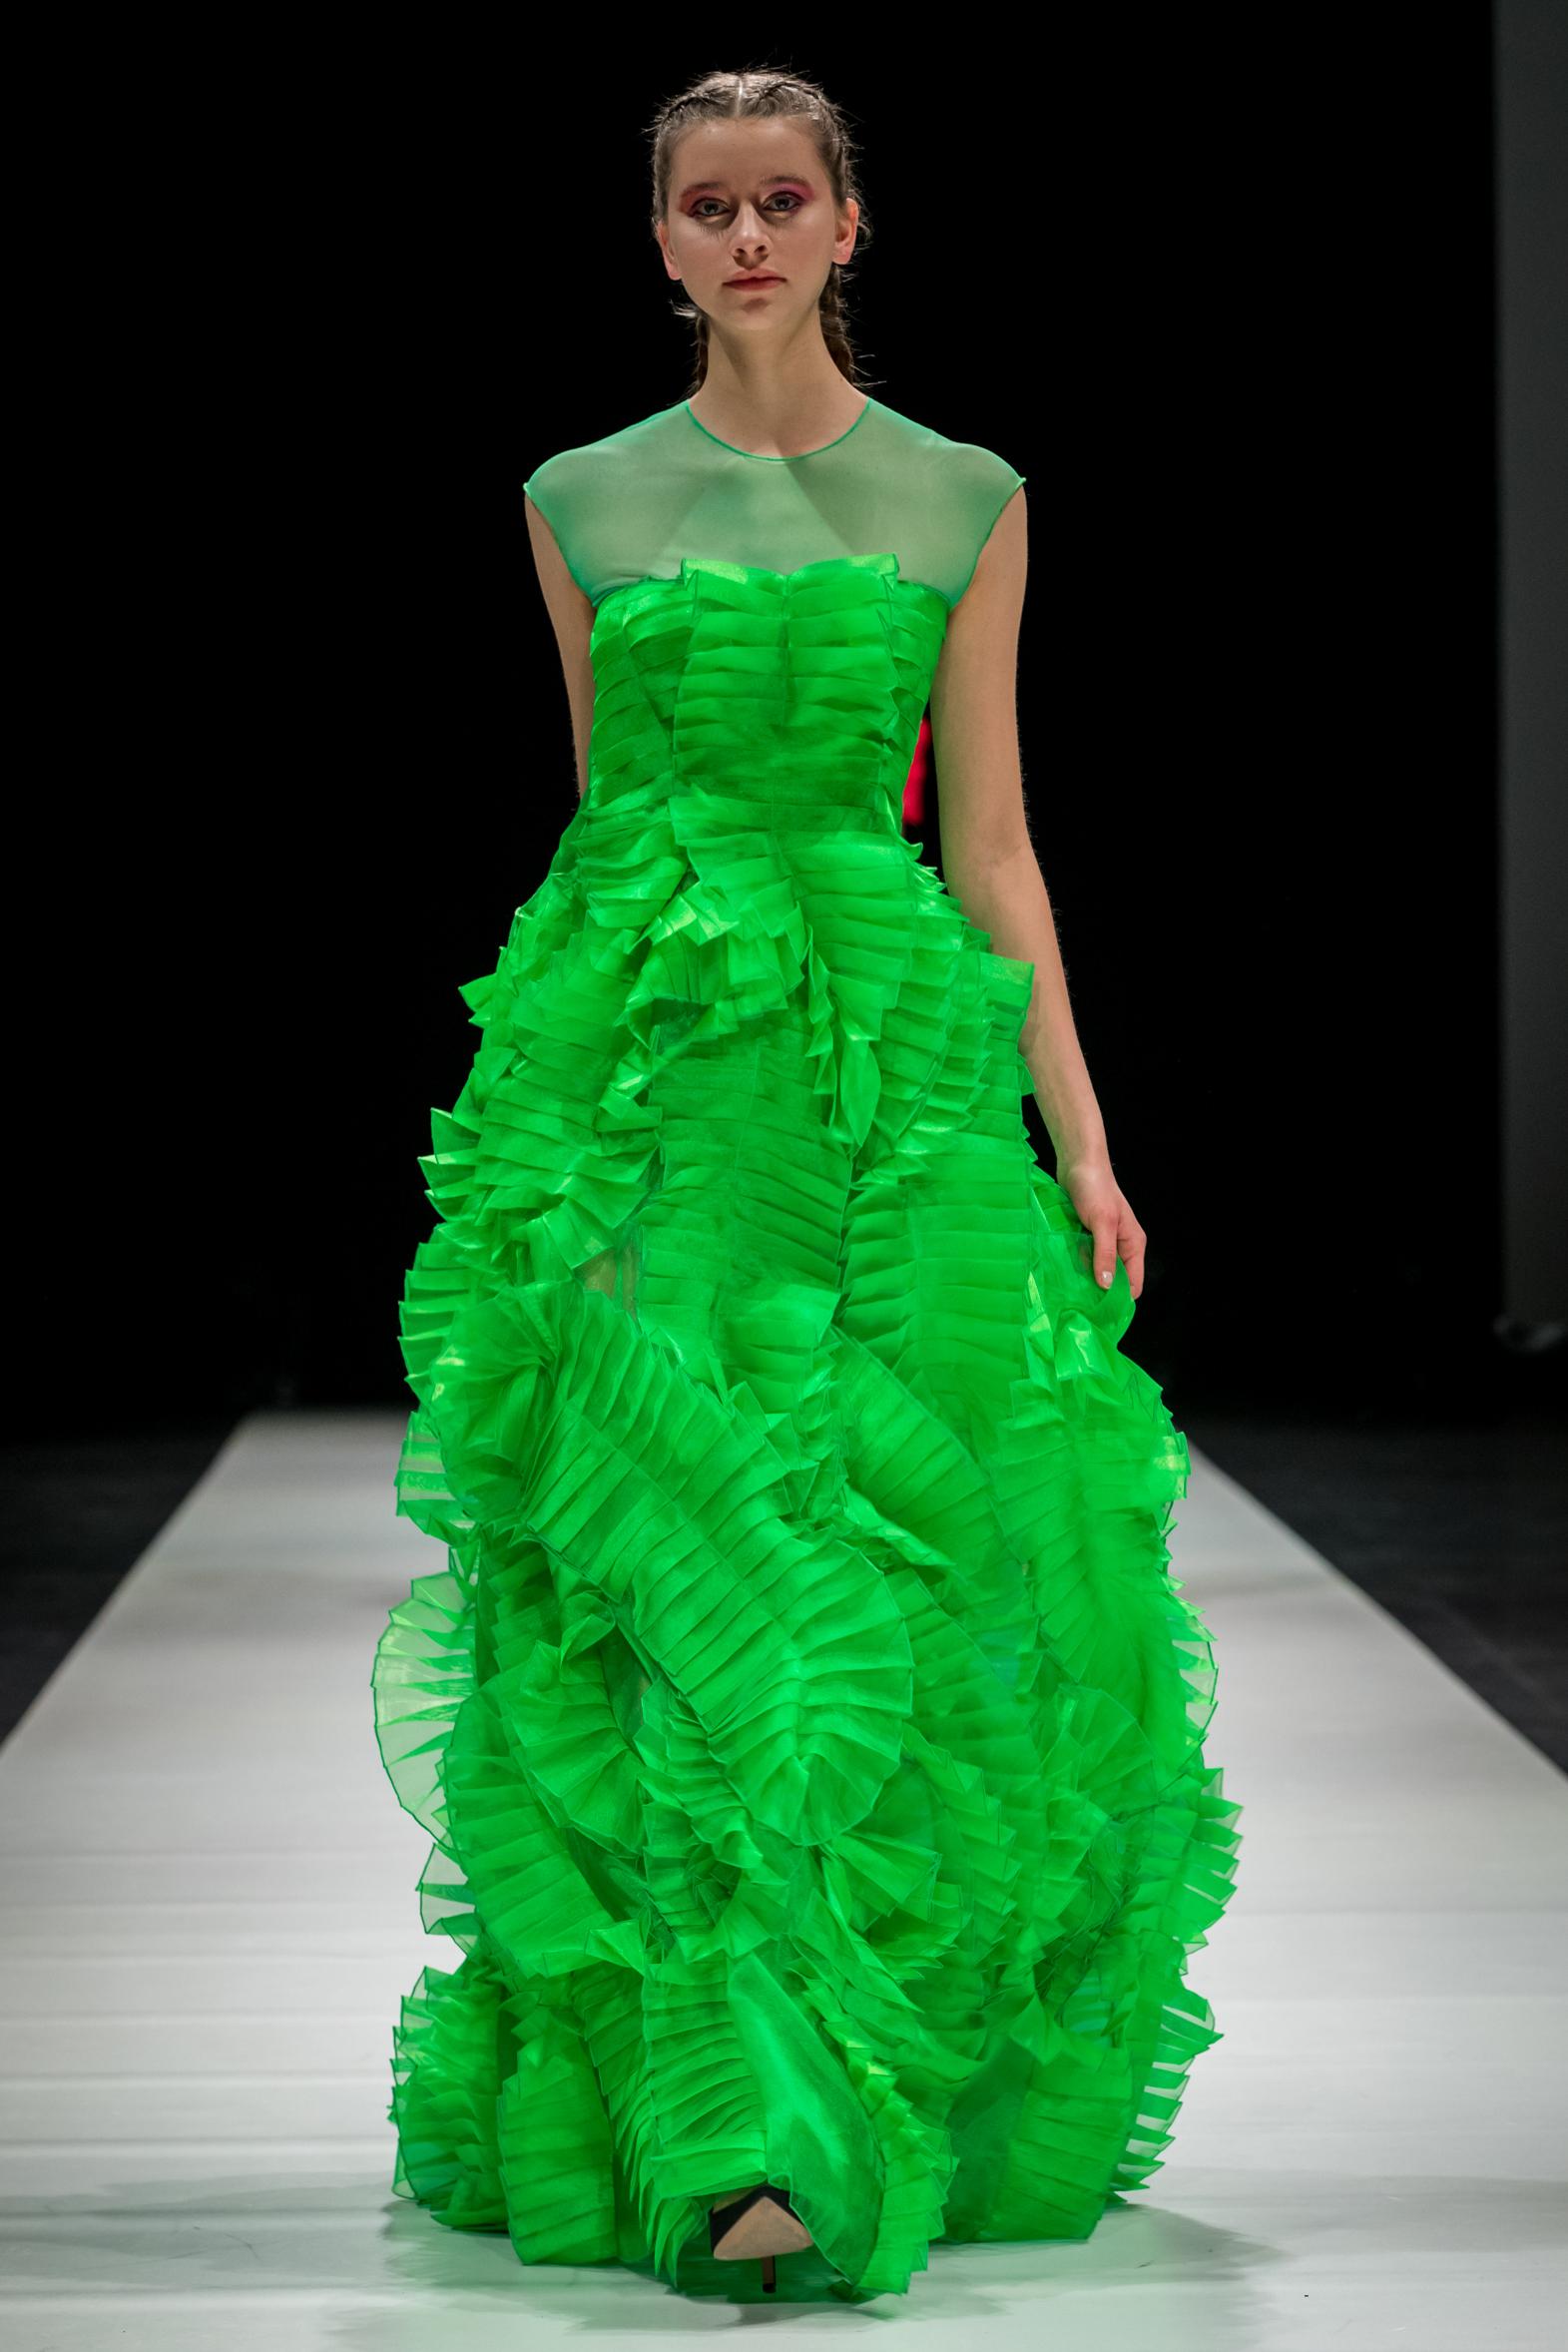 Ketlin Bachmanni disainitud kleit